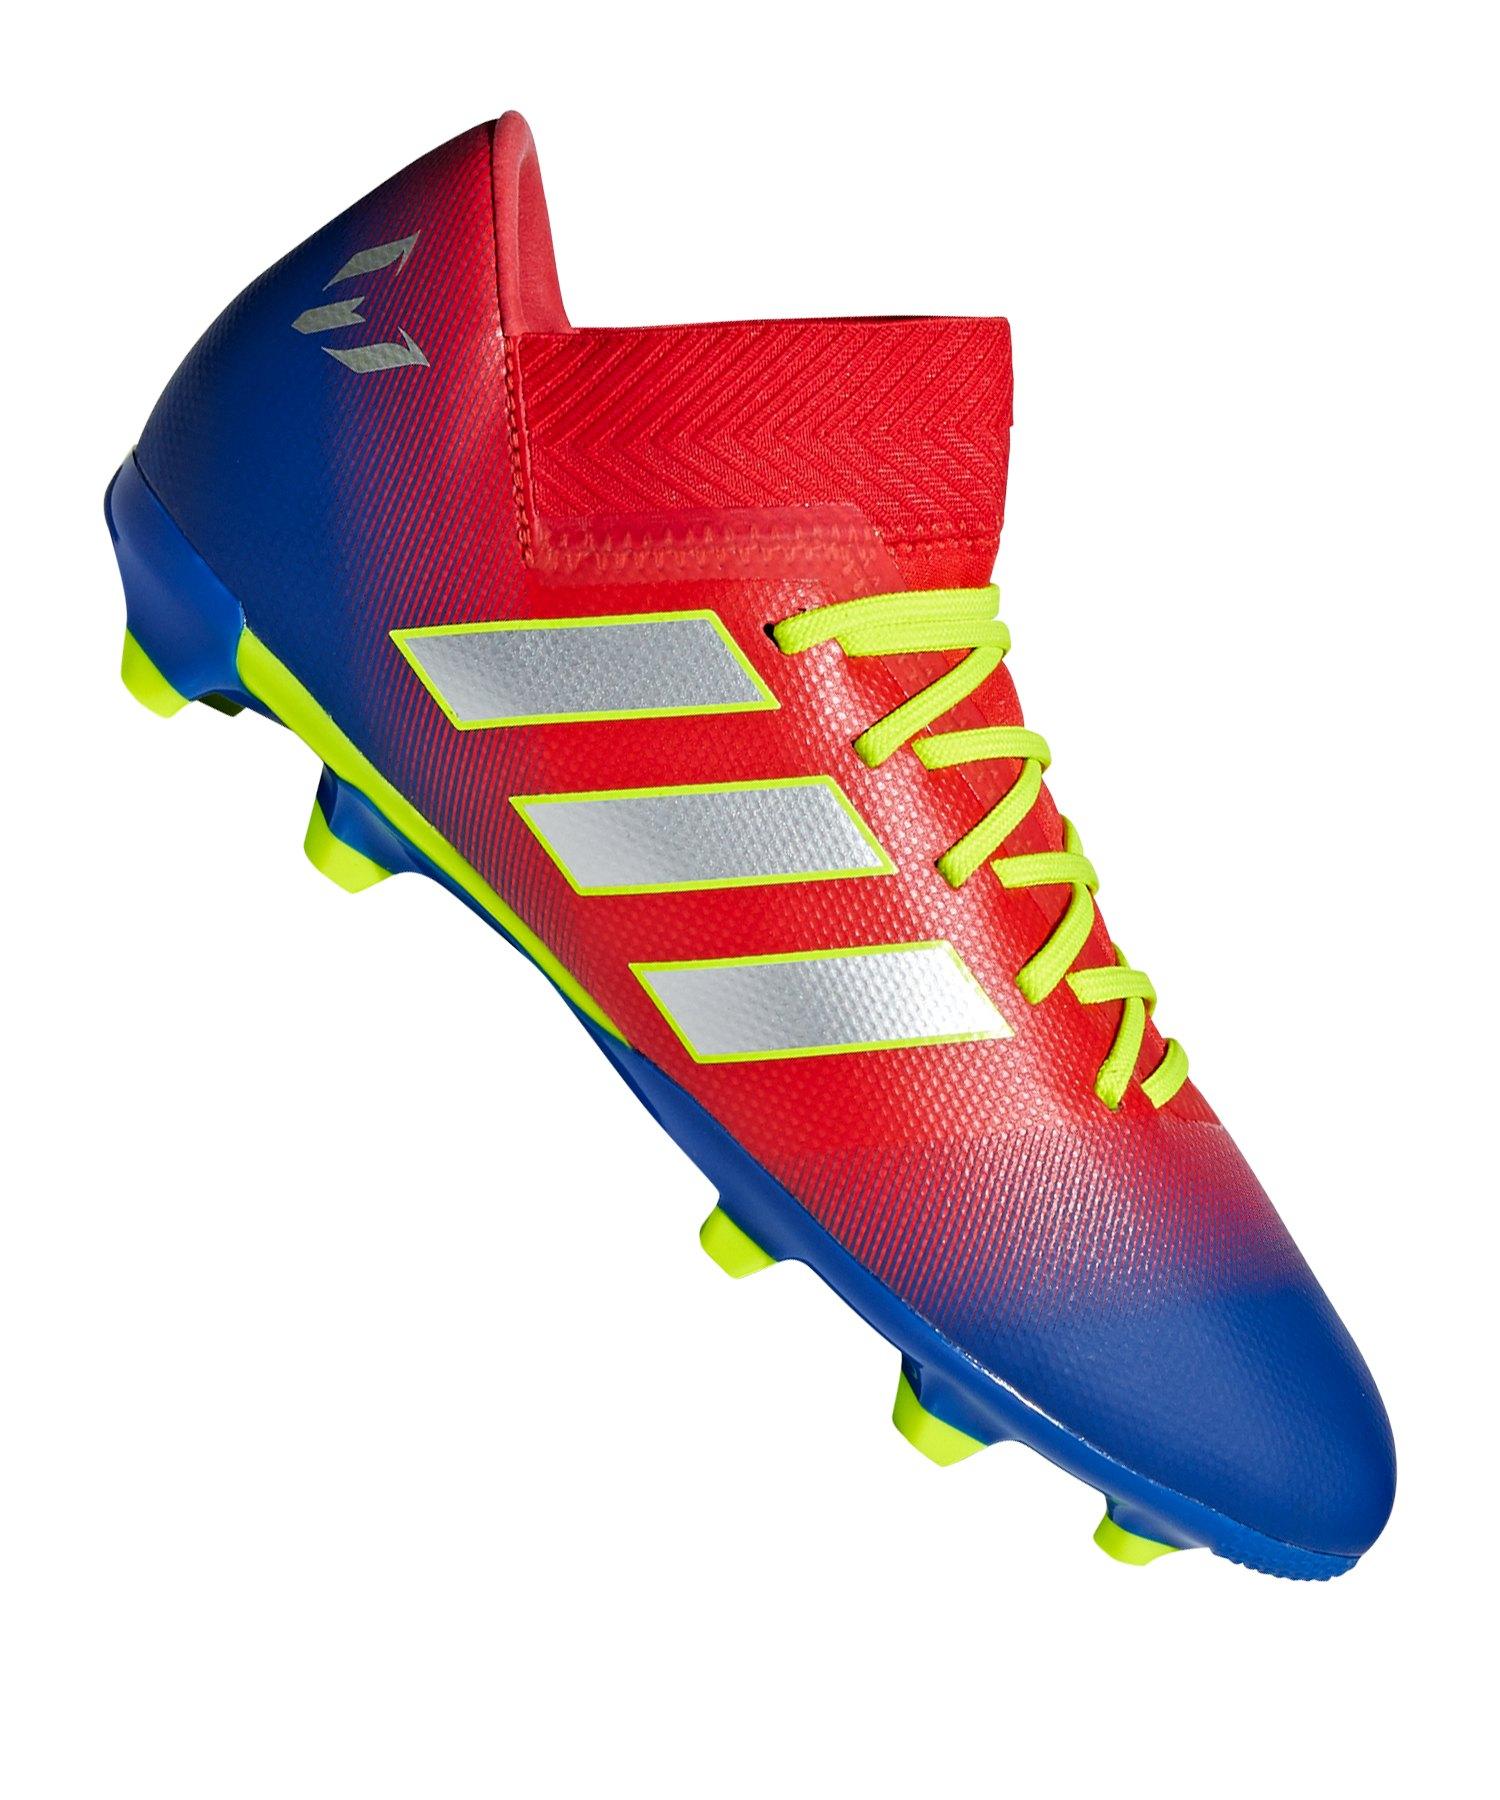 adidas NEMEZIZ Messi 18.3 FG J Kids Rot Blau - rot